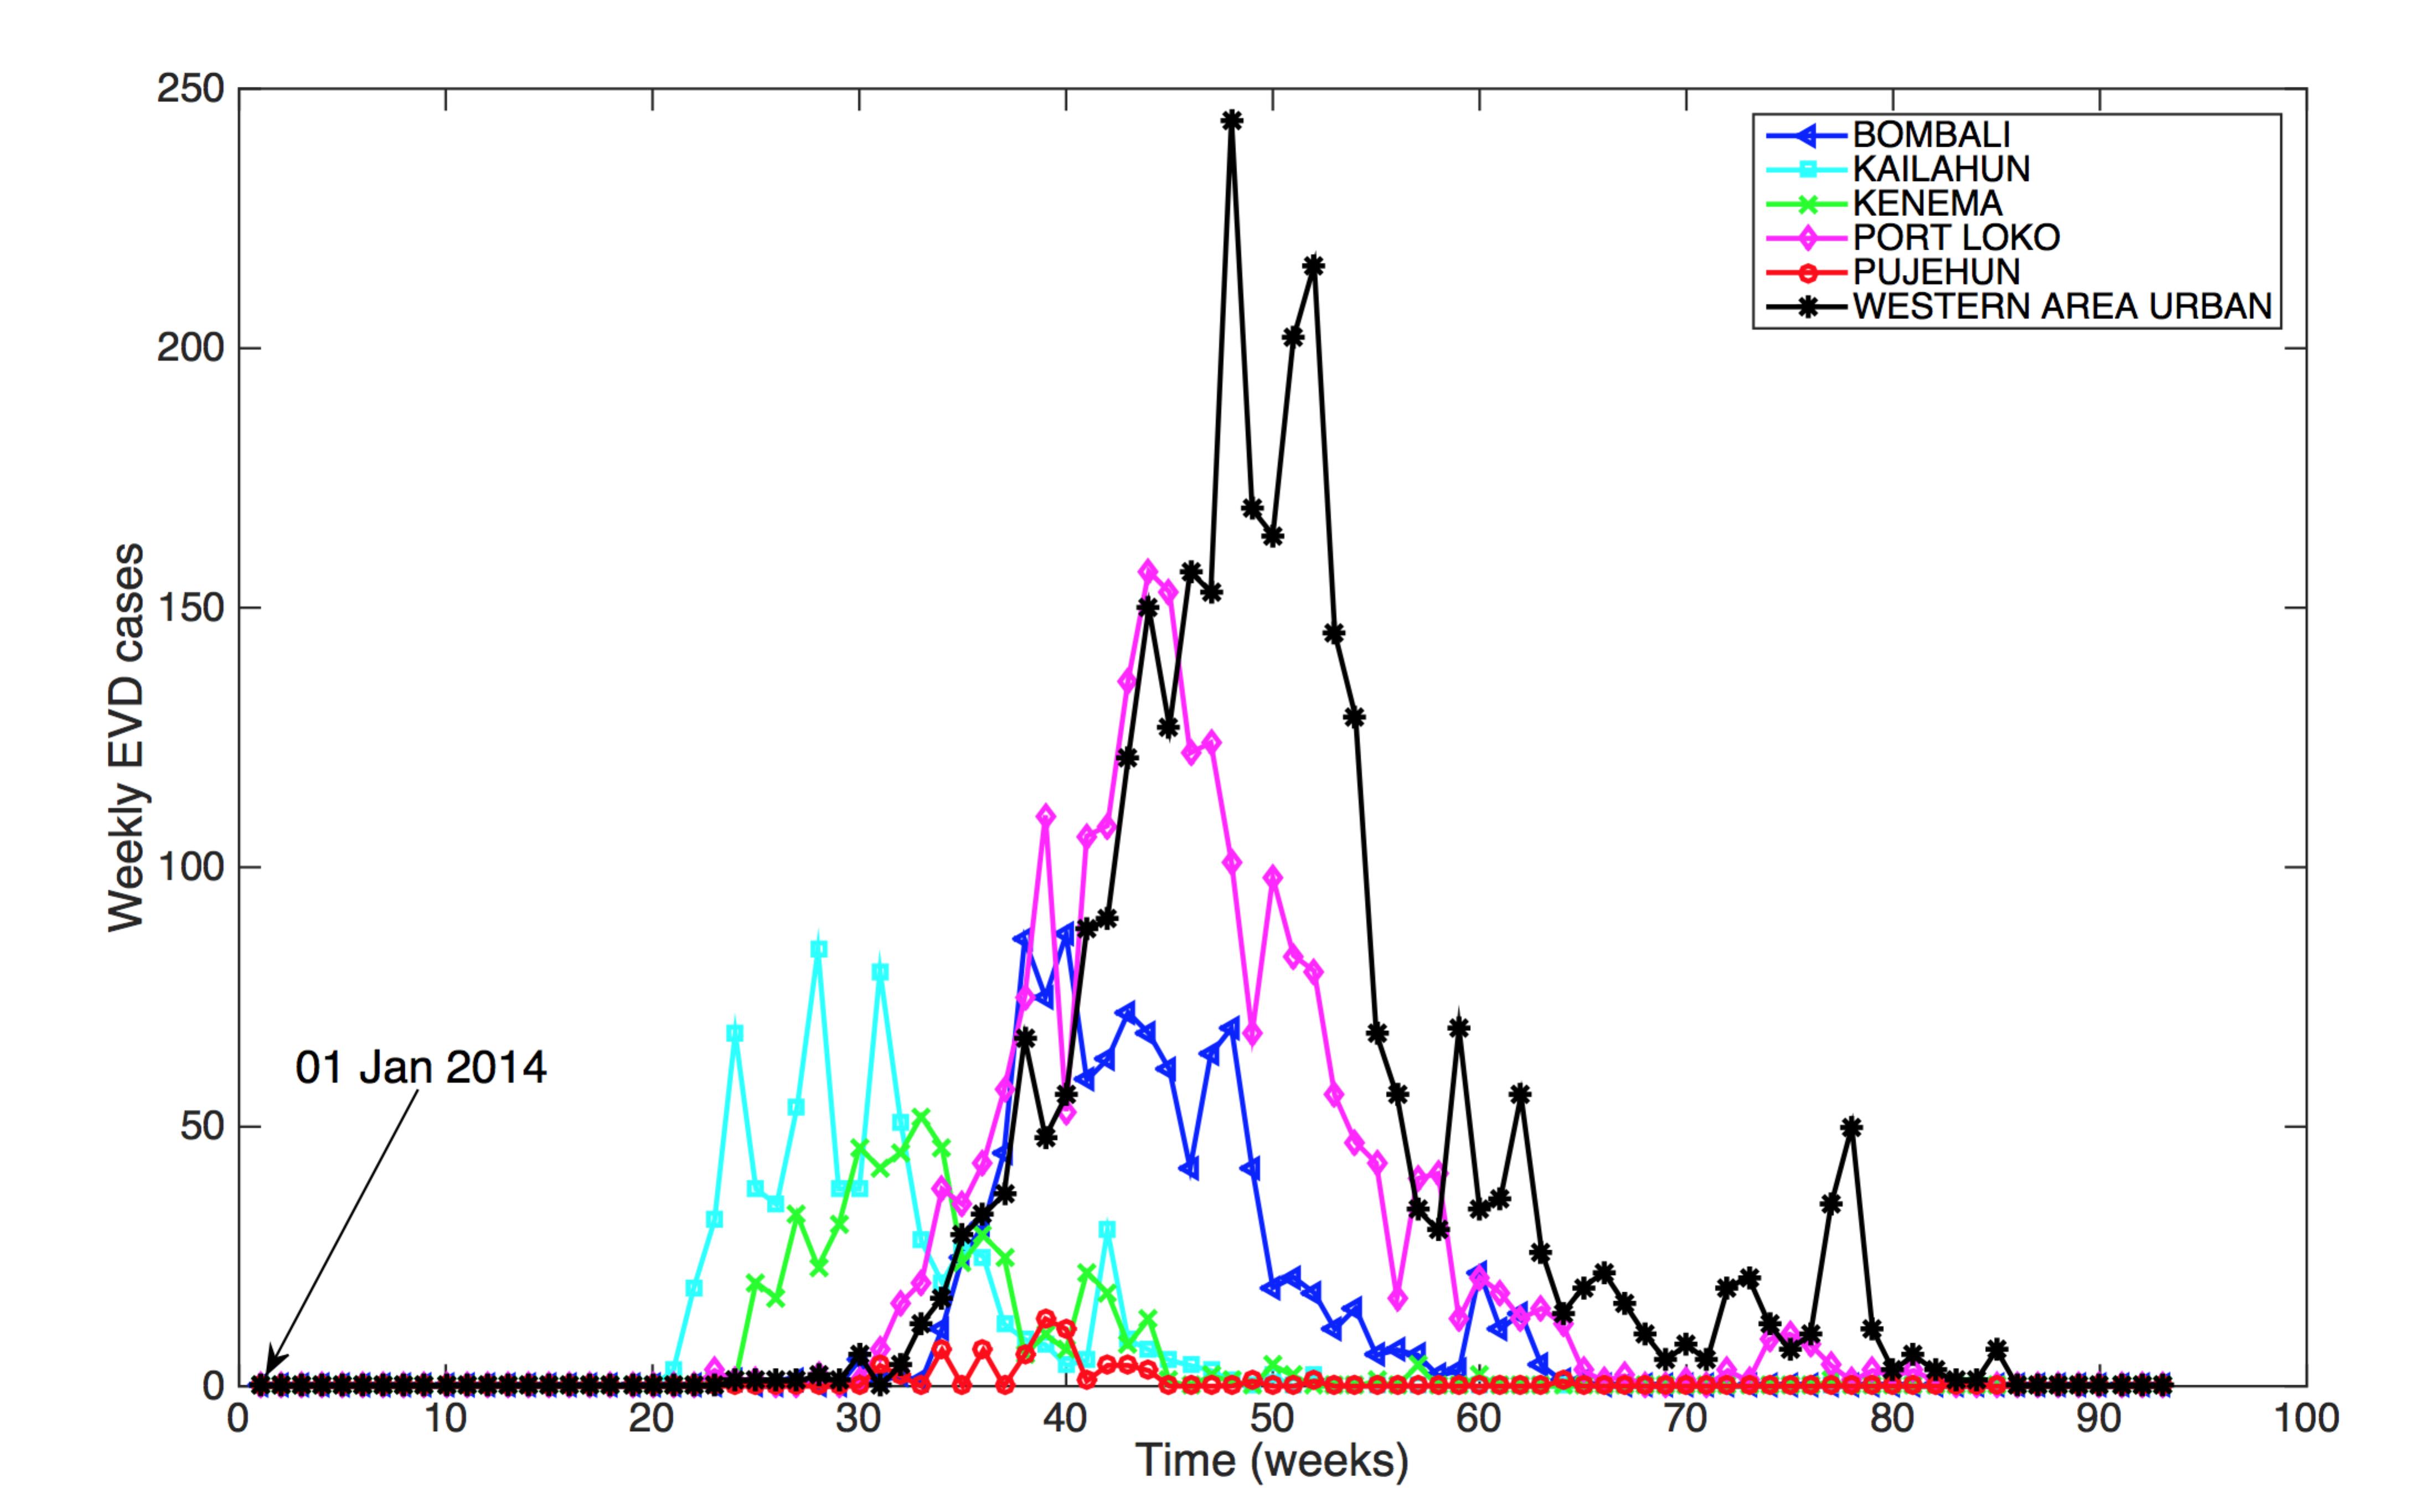 The temporal progression of the Ebola epidemic in representative districts of Sierra Leone